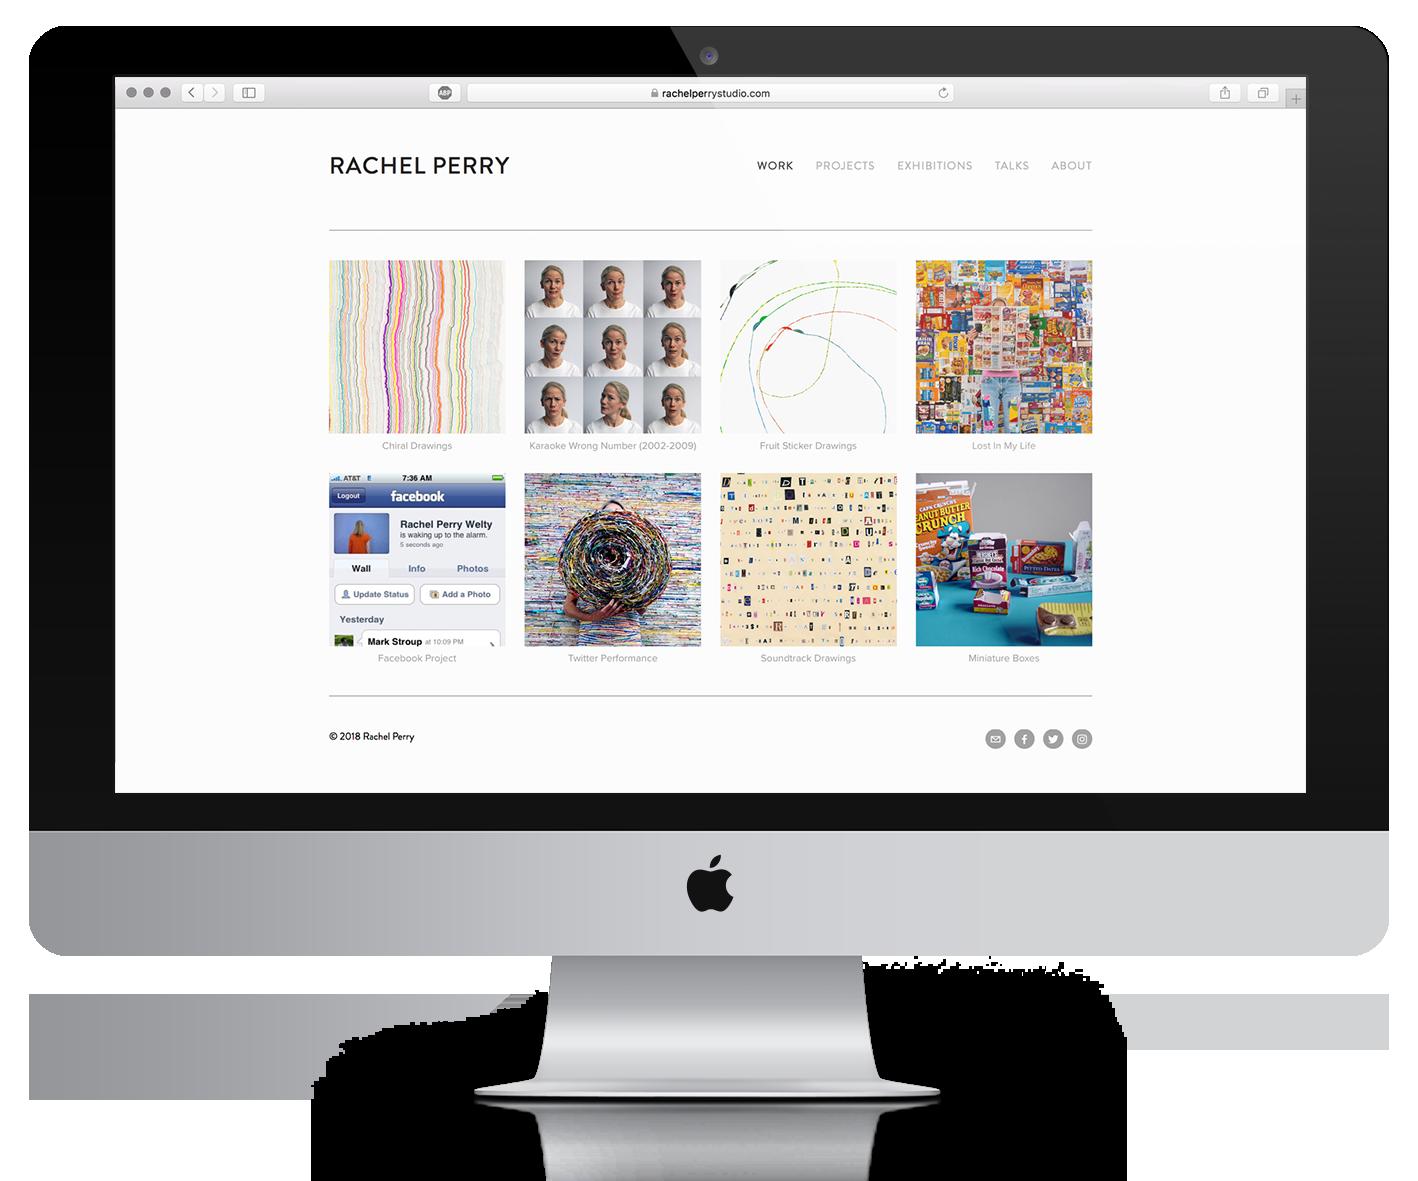 Site design by Creative Katz